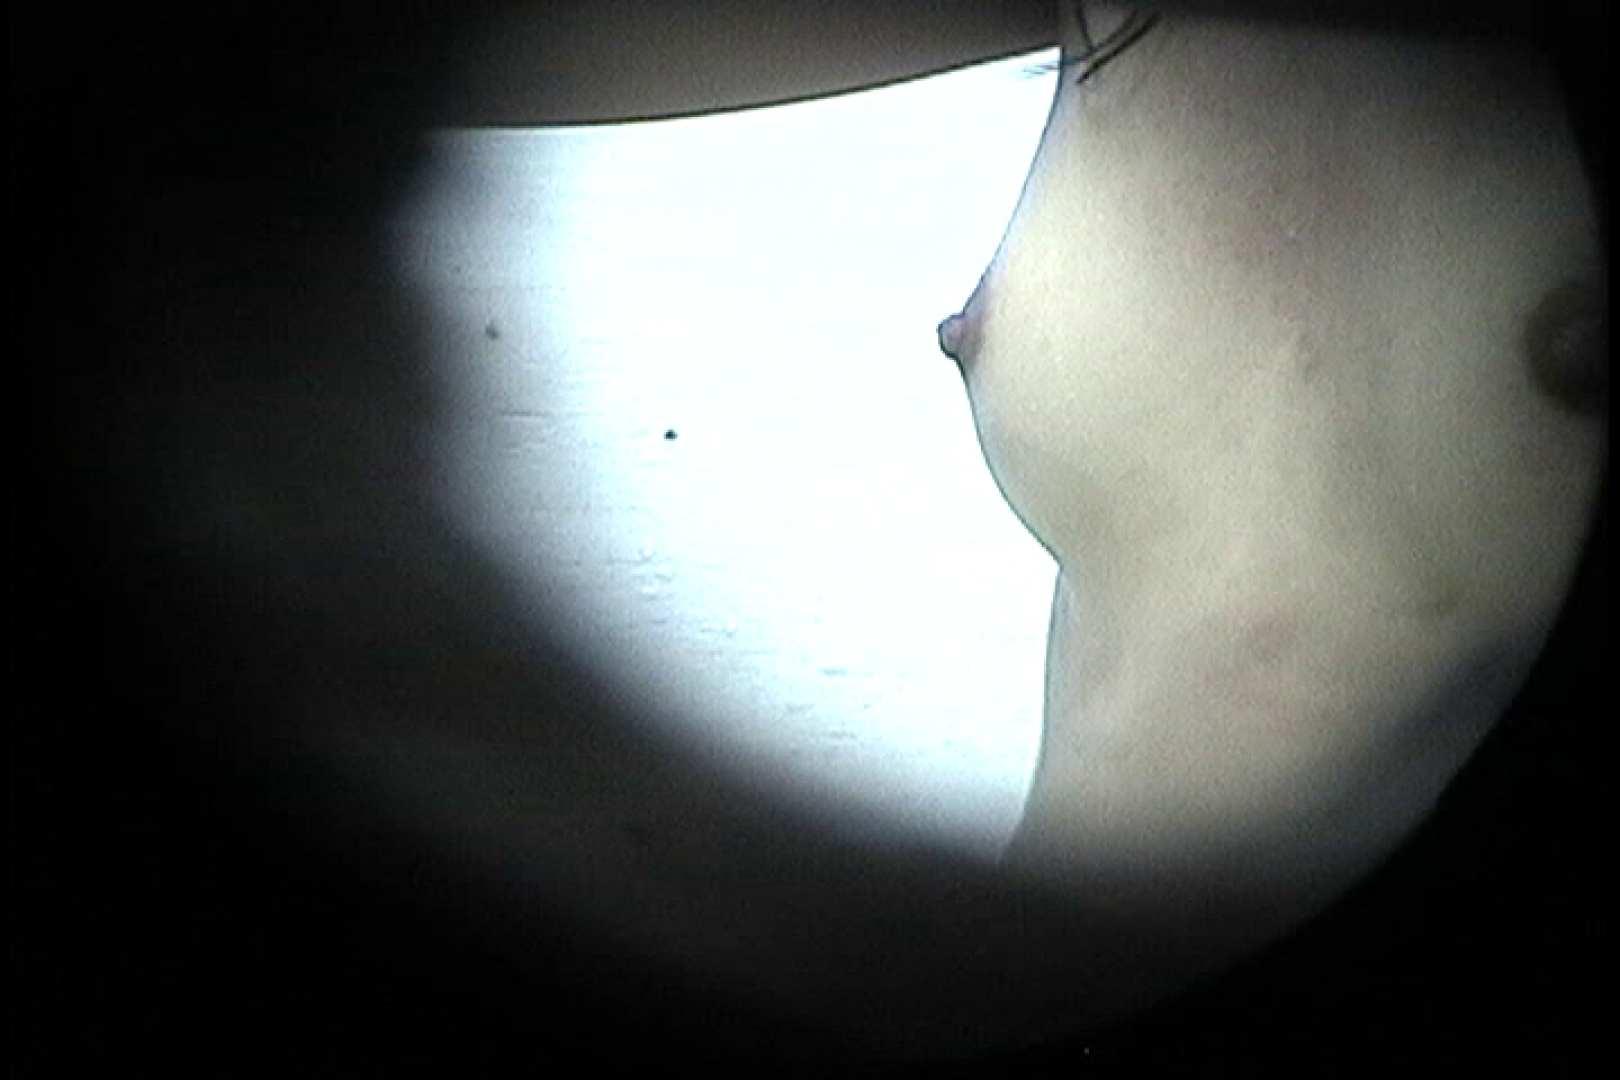 No.24 ビキニの割には陰毛は獰猛、ハミ毛が心配 接写  108画像 40